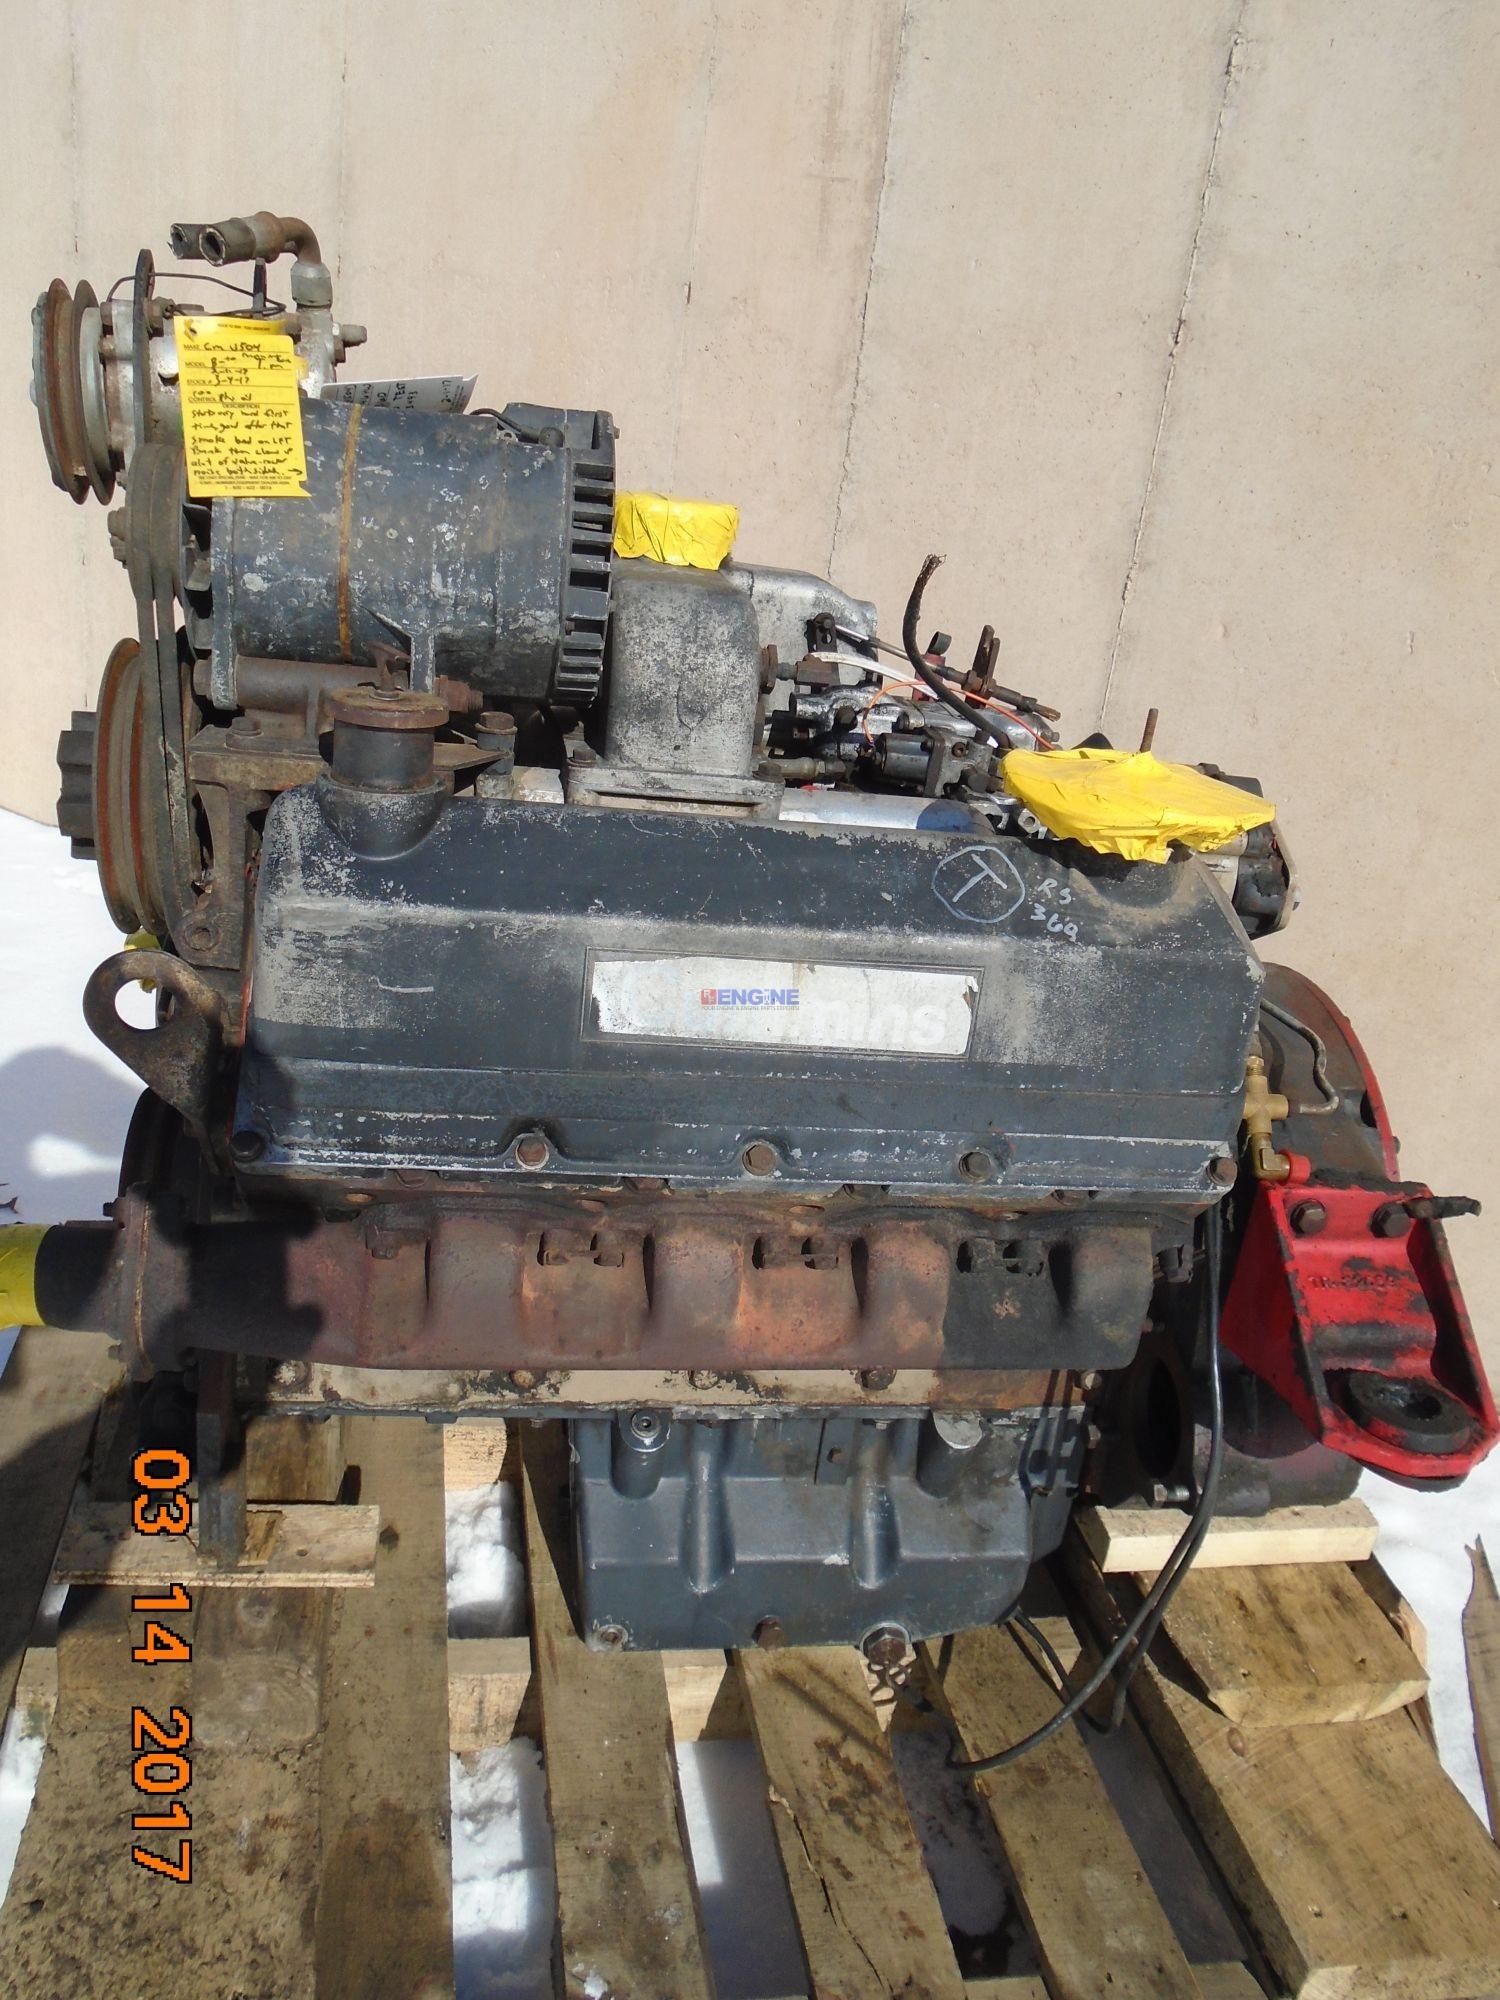 R. F. Engine Cummins V8-504 OEM Engine Complete Mechanics Rebuildable Special Running Core